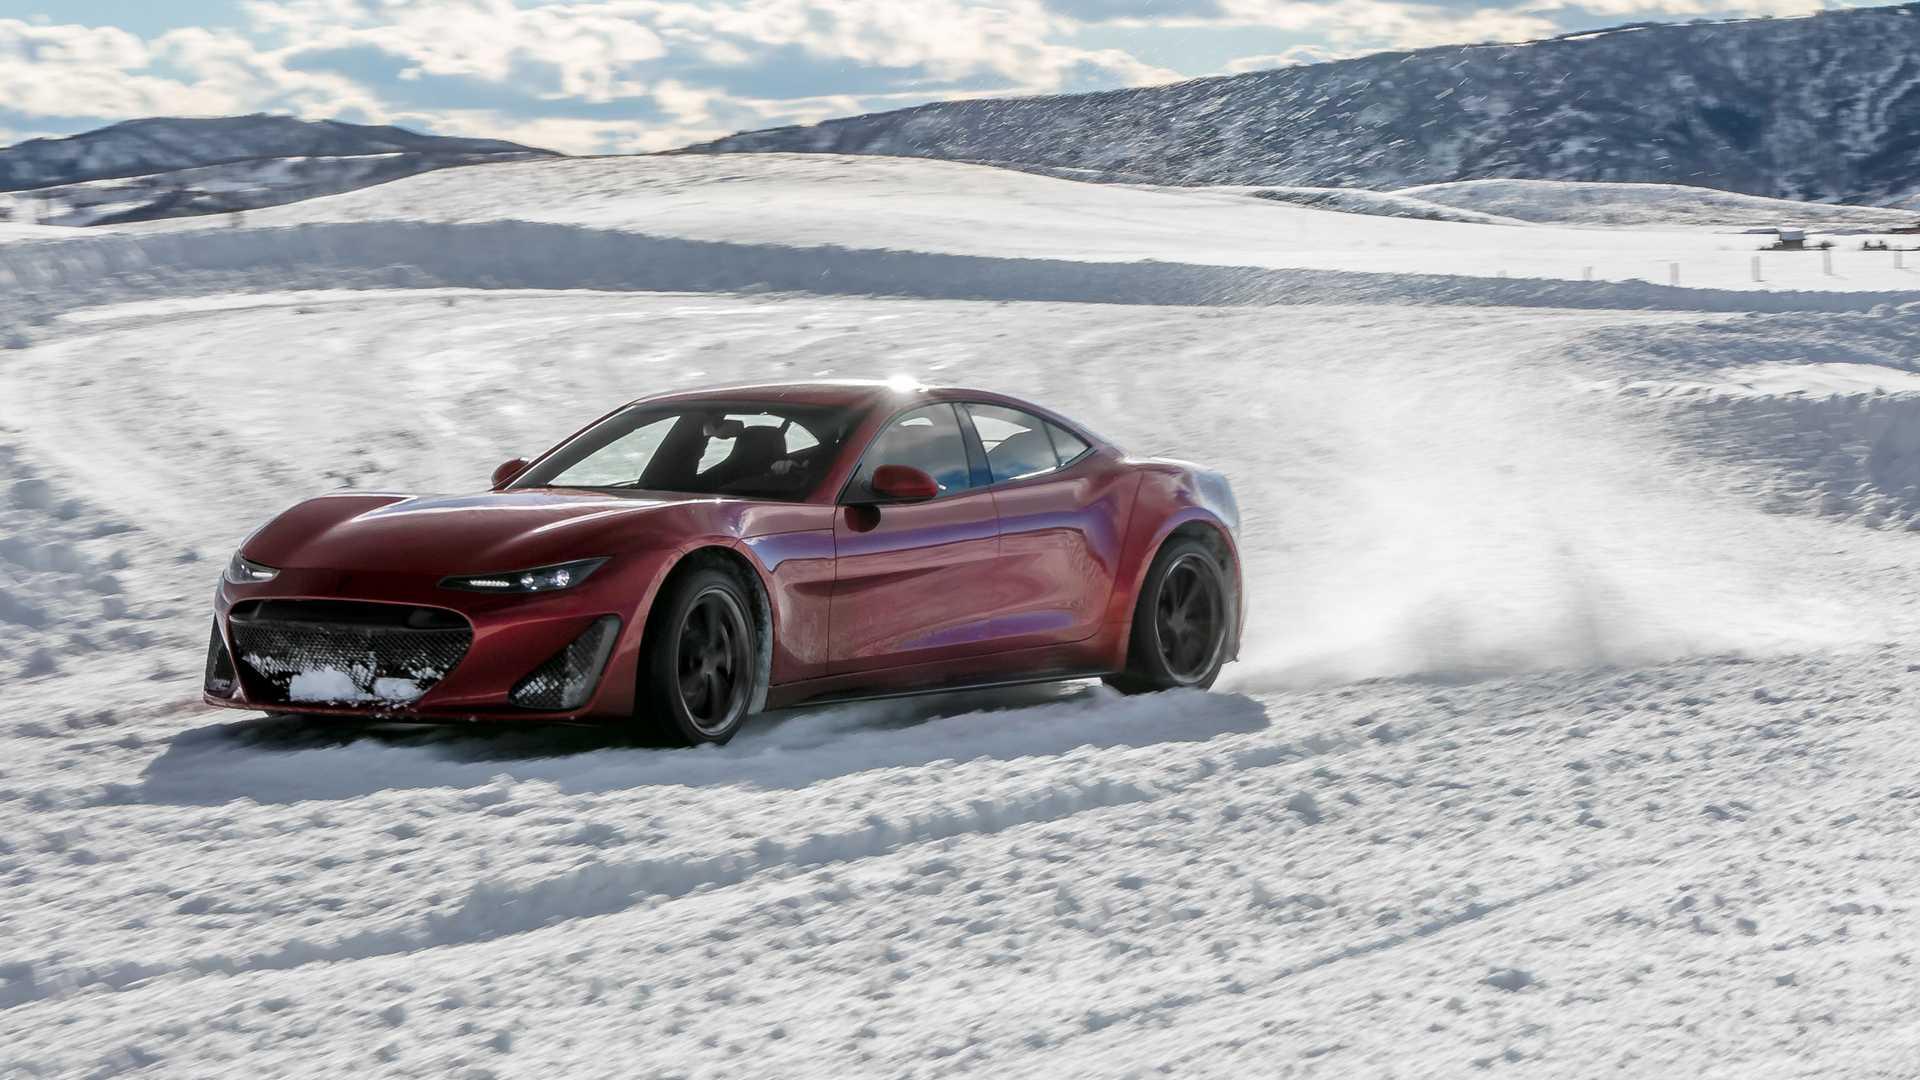 Drako-GTE-Winter-Testing-10